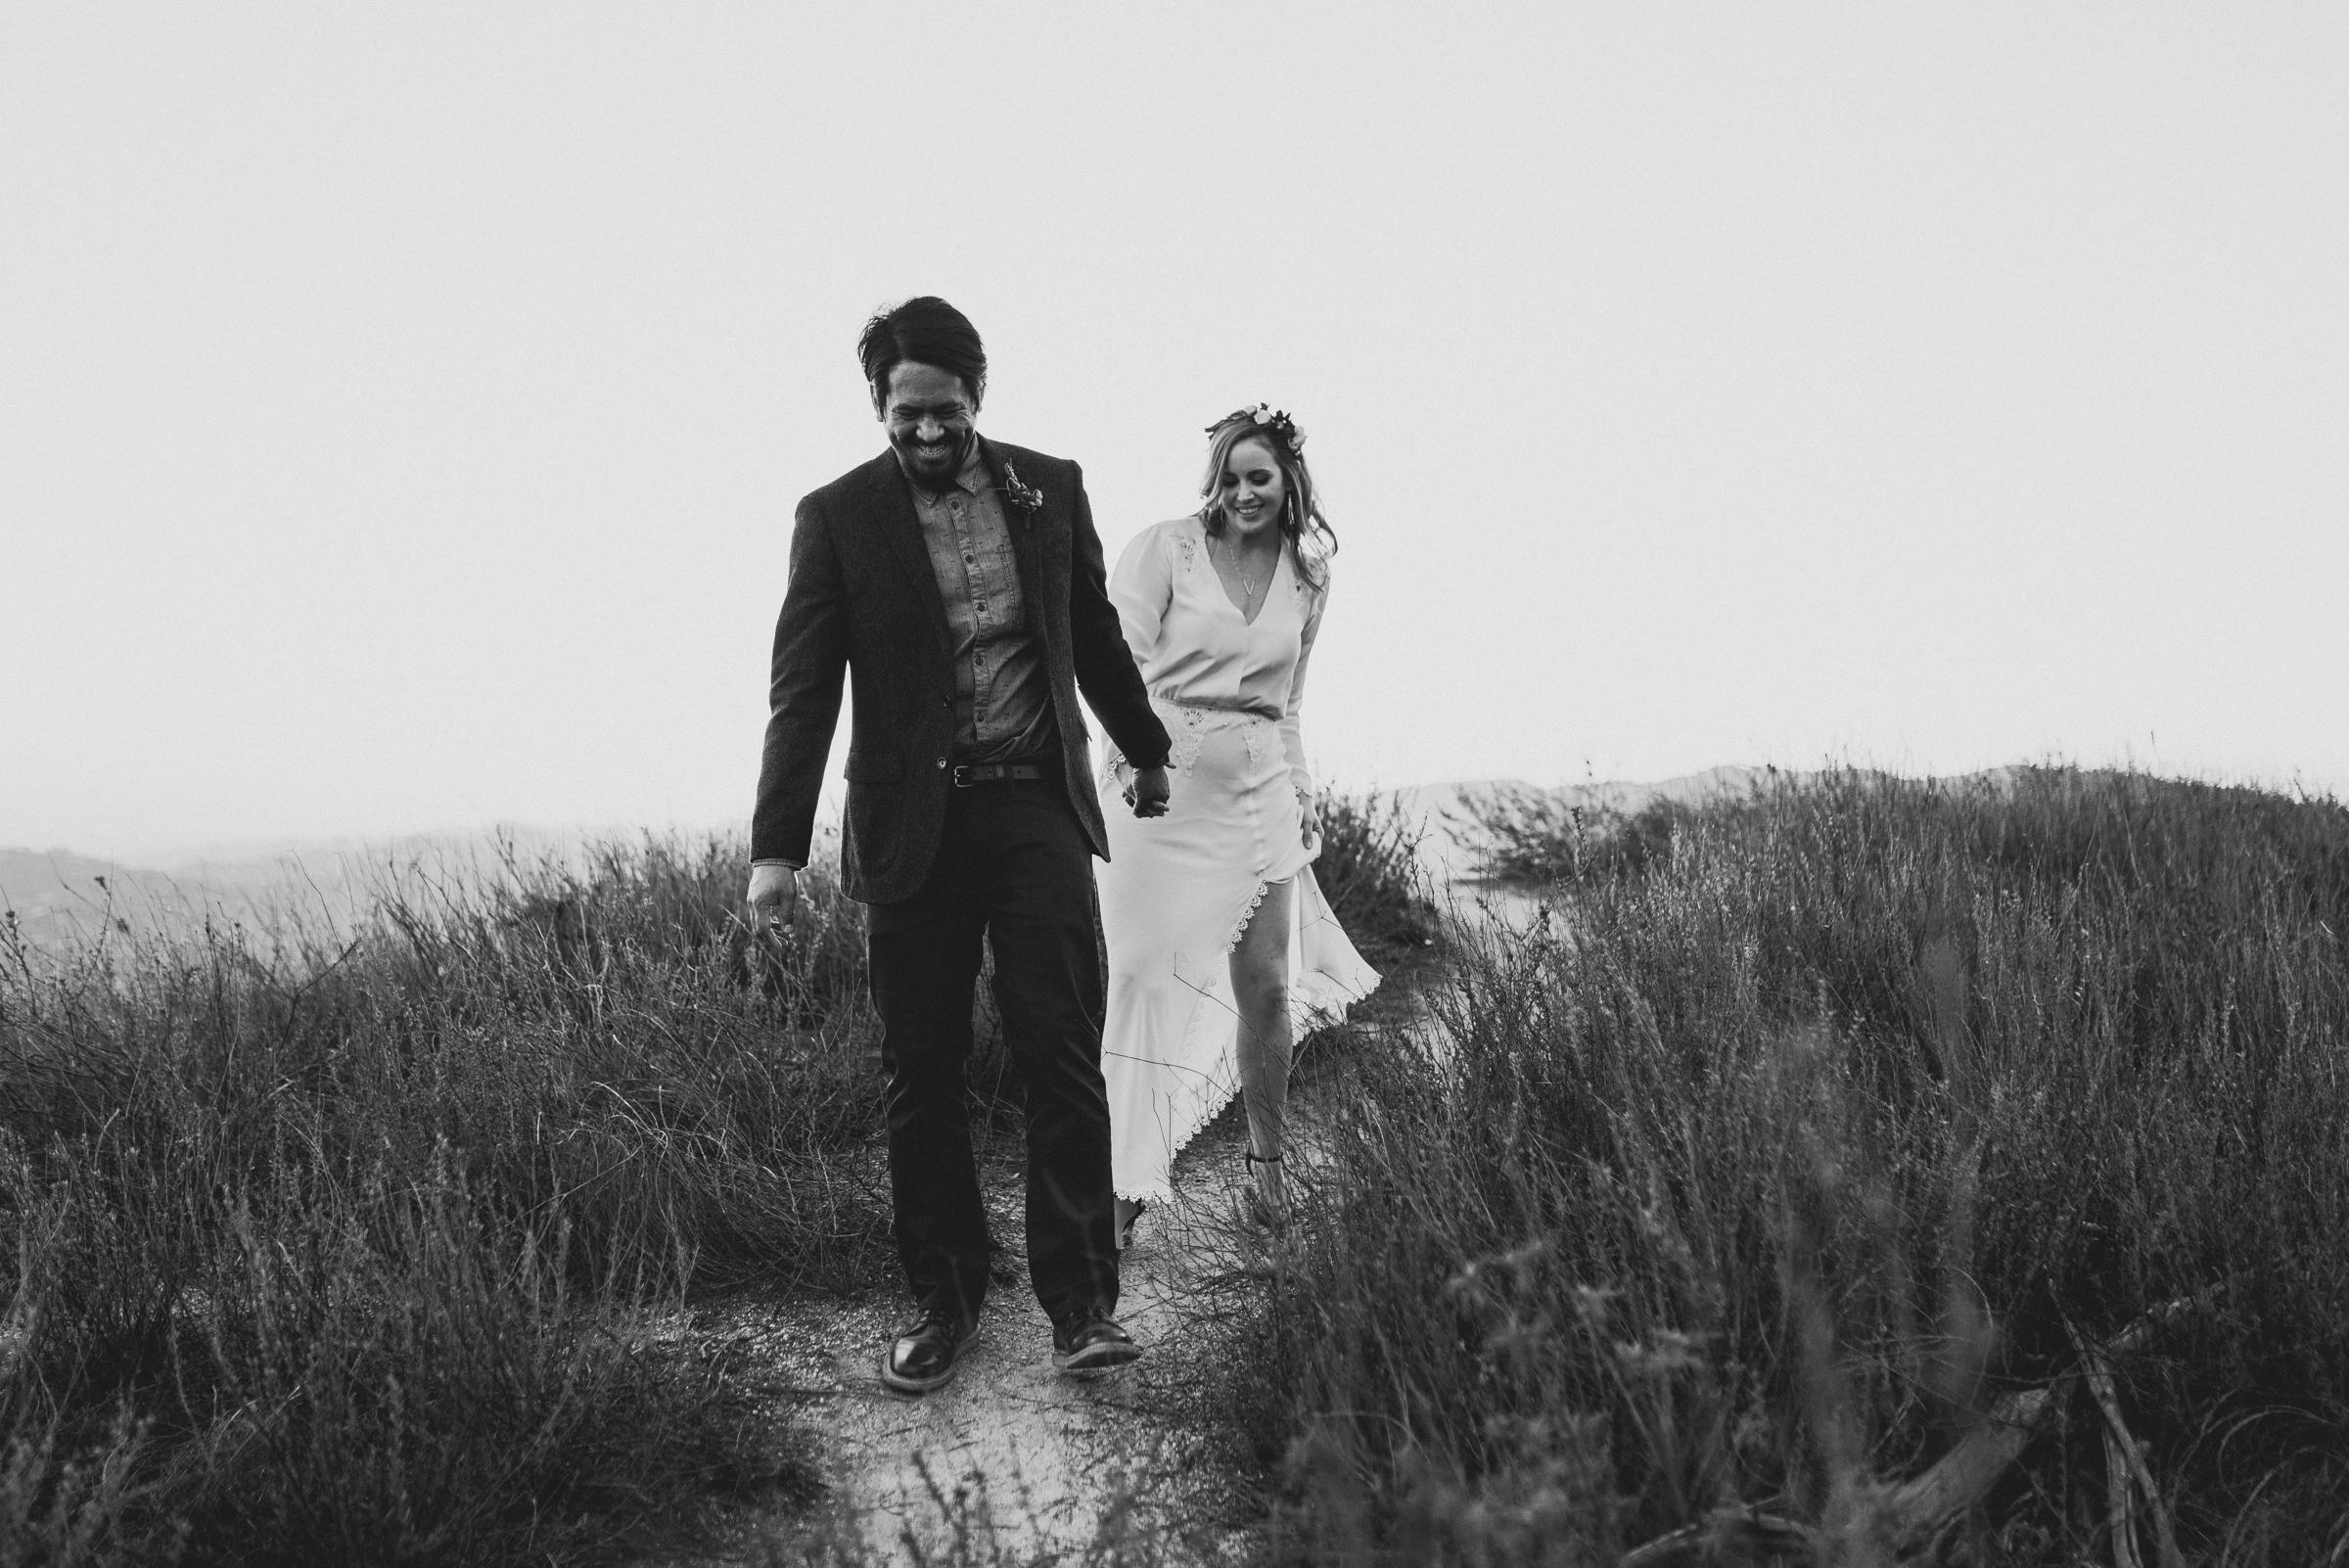 ©Isaiah + Taylor Photography - Intimate Elopement, Eaton Canyon, Los Angeles Wedding Photographer-107.jpg